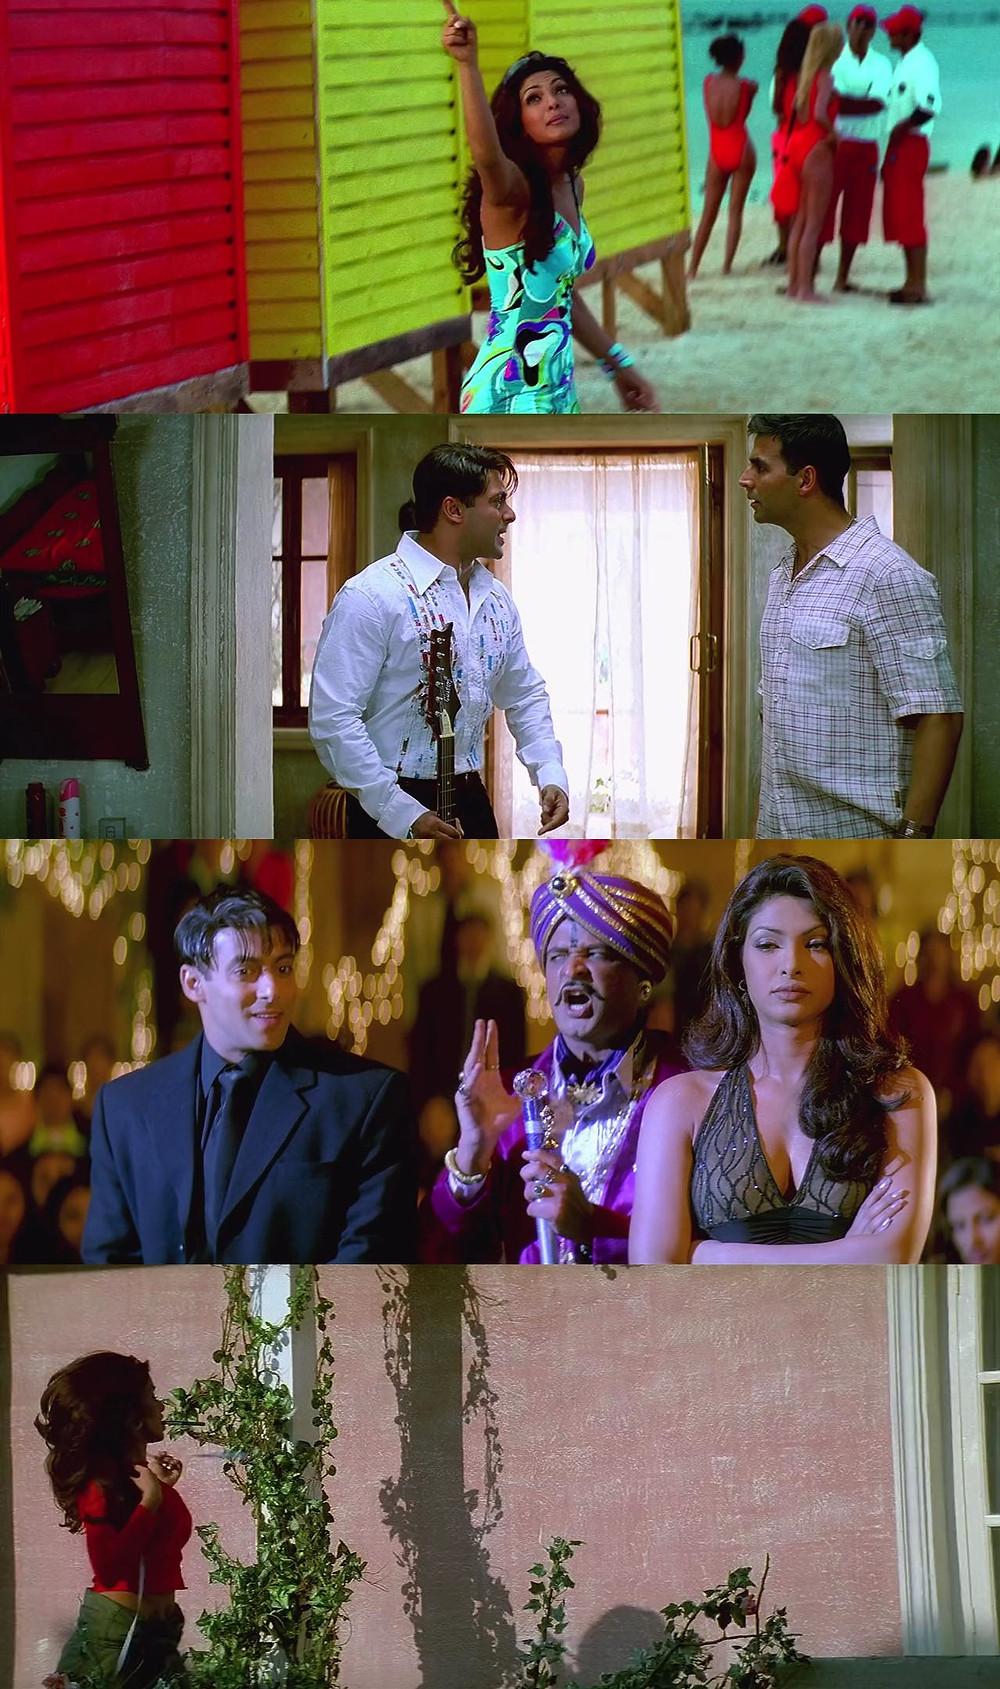 Download Mujhse Shaadi Karogi (2004) Hindi Movie Bluray